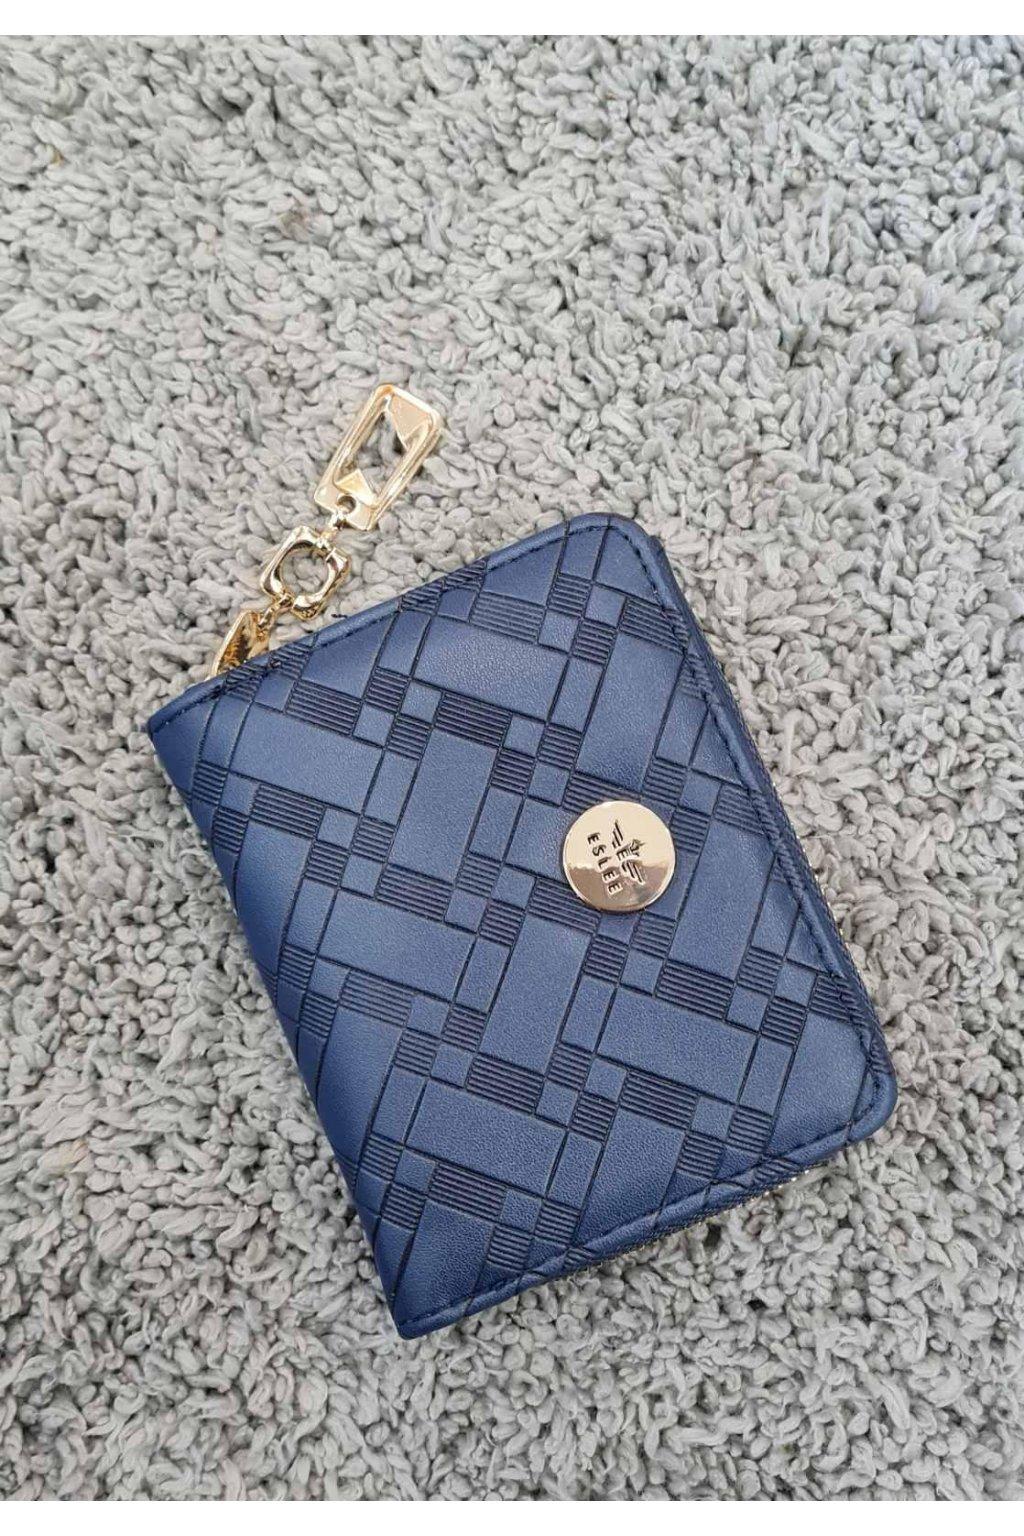 Dámská peněženka ELSLEE modrá